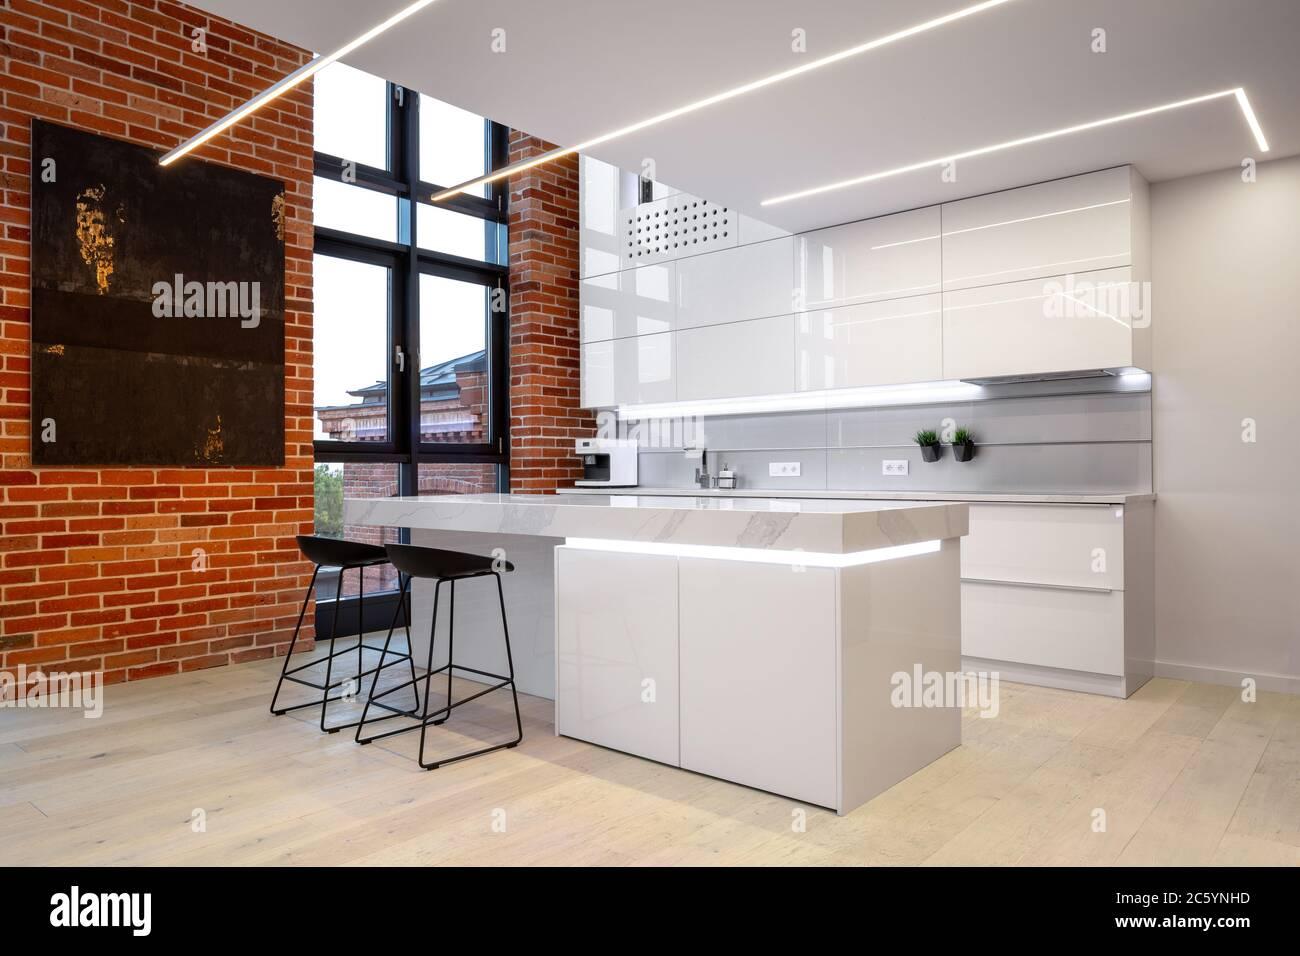 Luxury White Kitchen Interior With Loft Style Brick Wall And Big Window Stock Photo Alamy